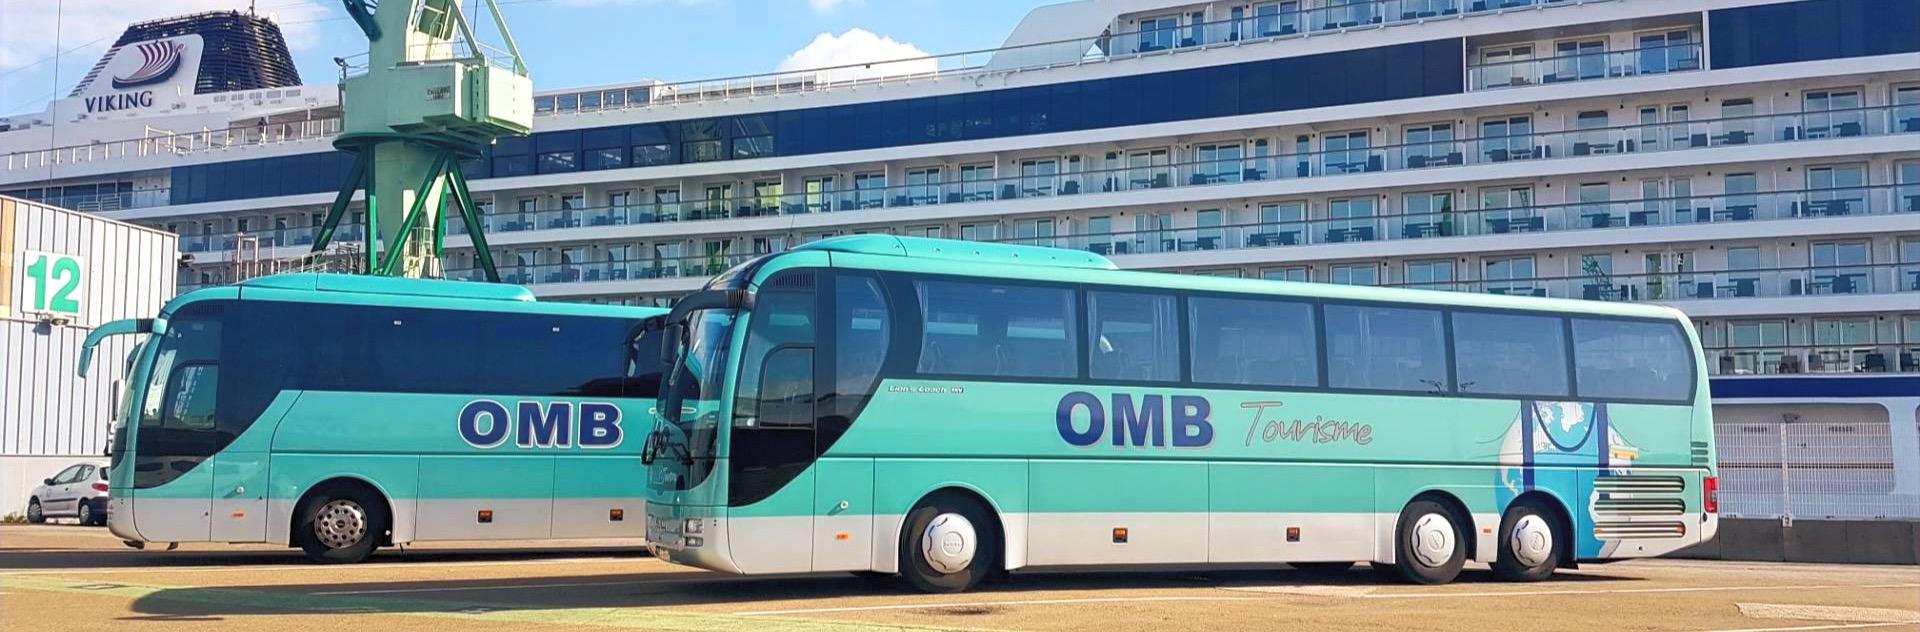 autocar ombtourisme